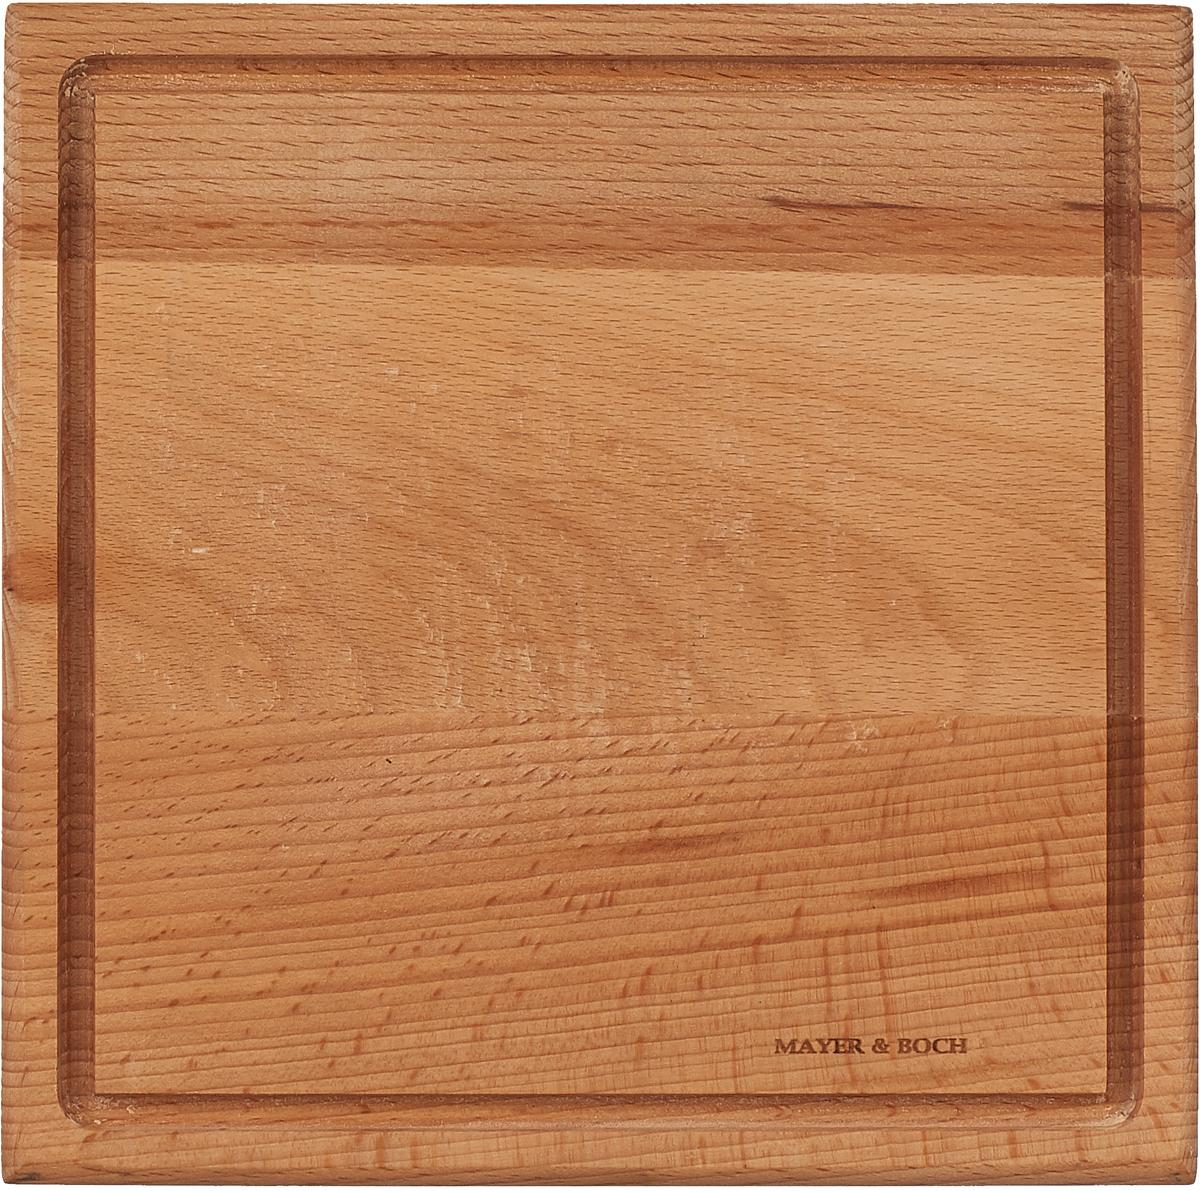 Разделочная доска Mayer & Boch, 40027, коричневый, 30 х 30 см разделочная доска бамбук 35х18 см mayer and boch мв 22588